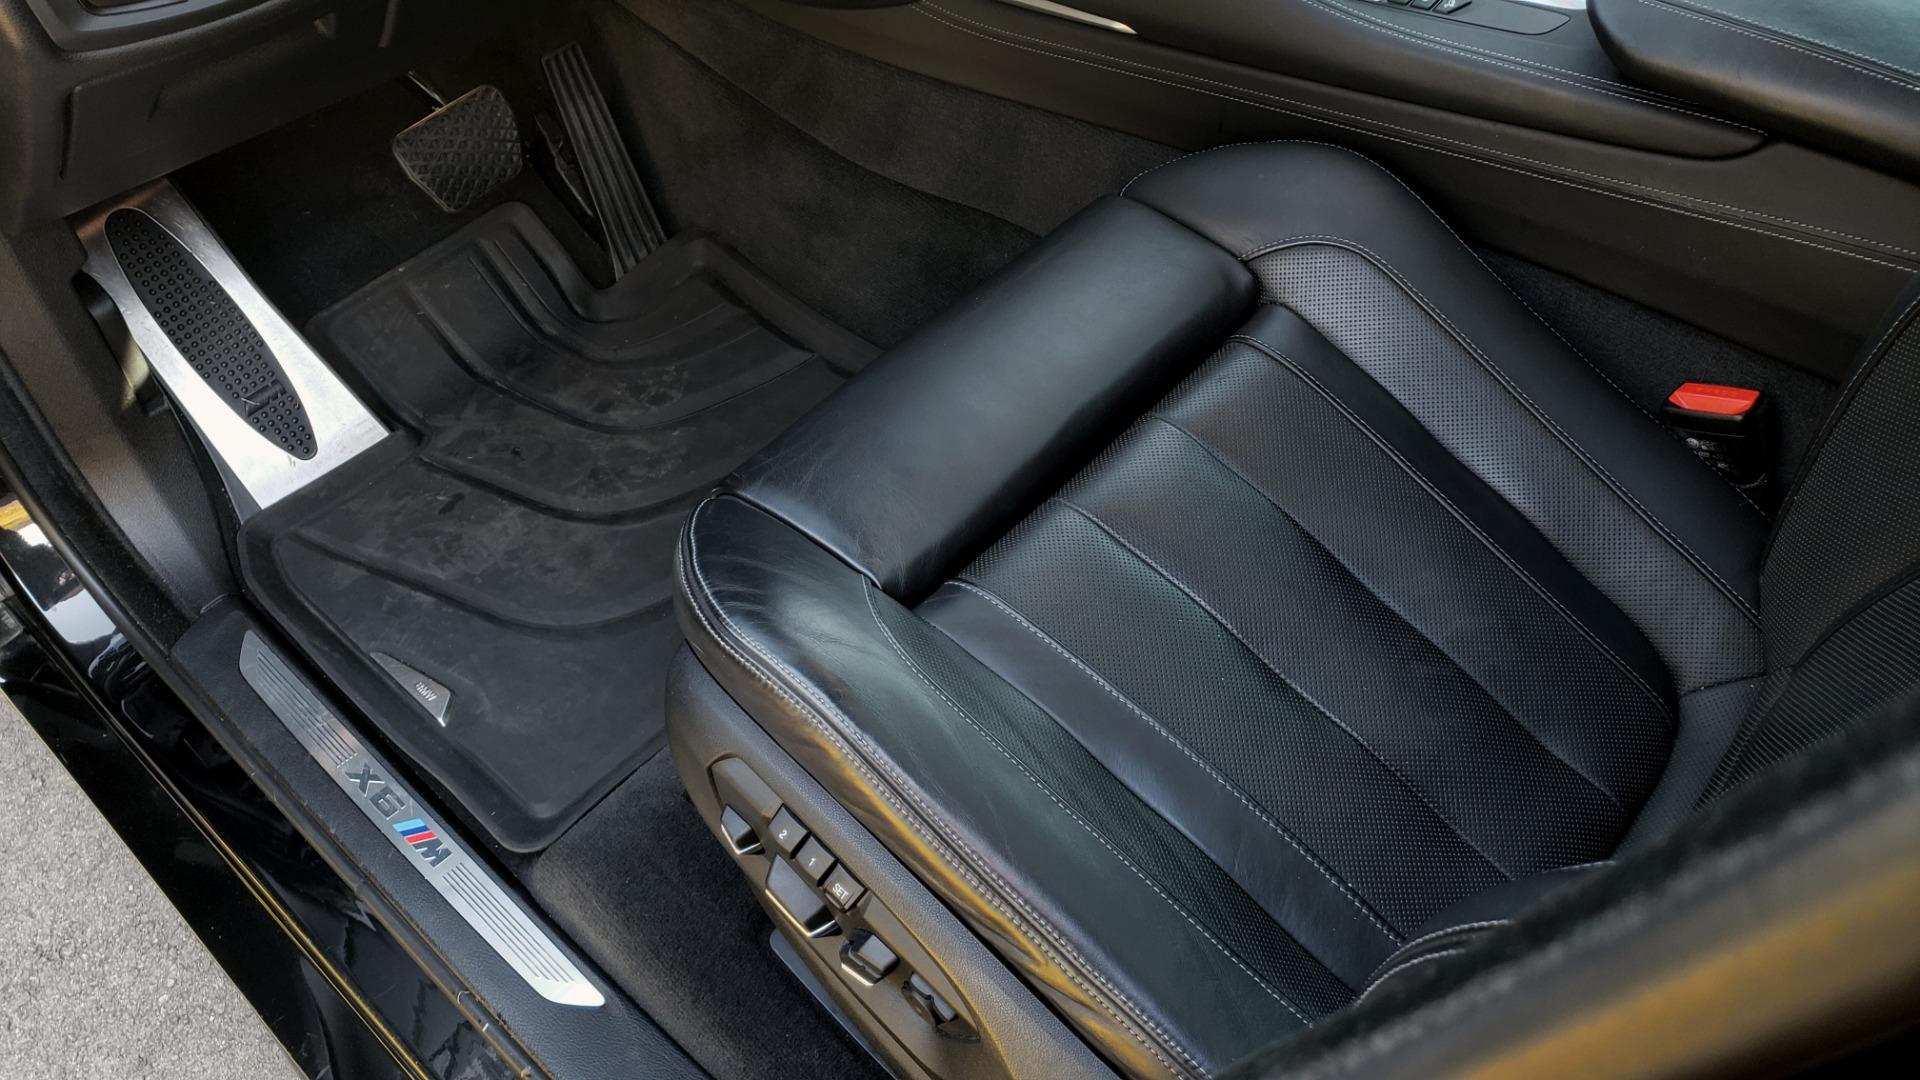 Used 2016 BMW X6 M EXEC PKG / DRVR ASST / NAV / SUNROOF / BLIND SPOT / REARVIEW for sale Sold at Formula Imports in Charlotte NC 28227 33